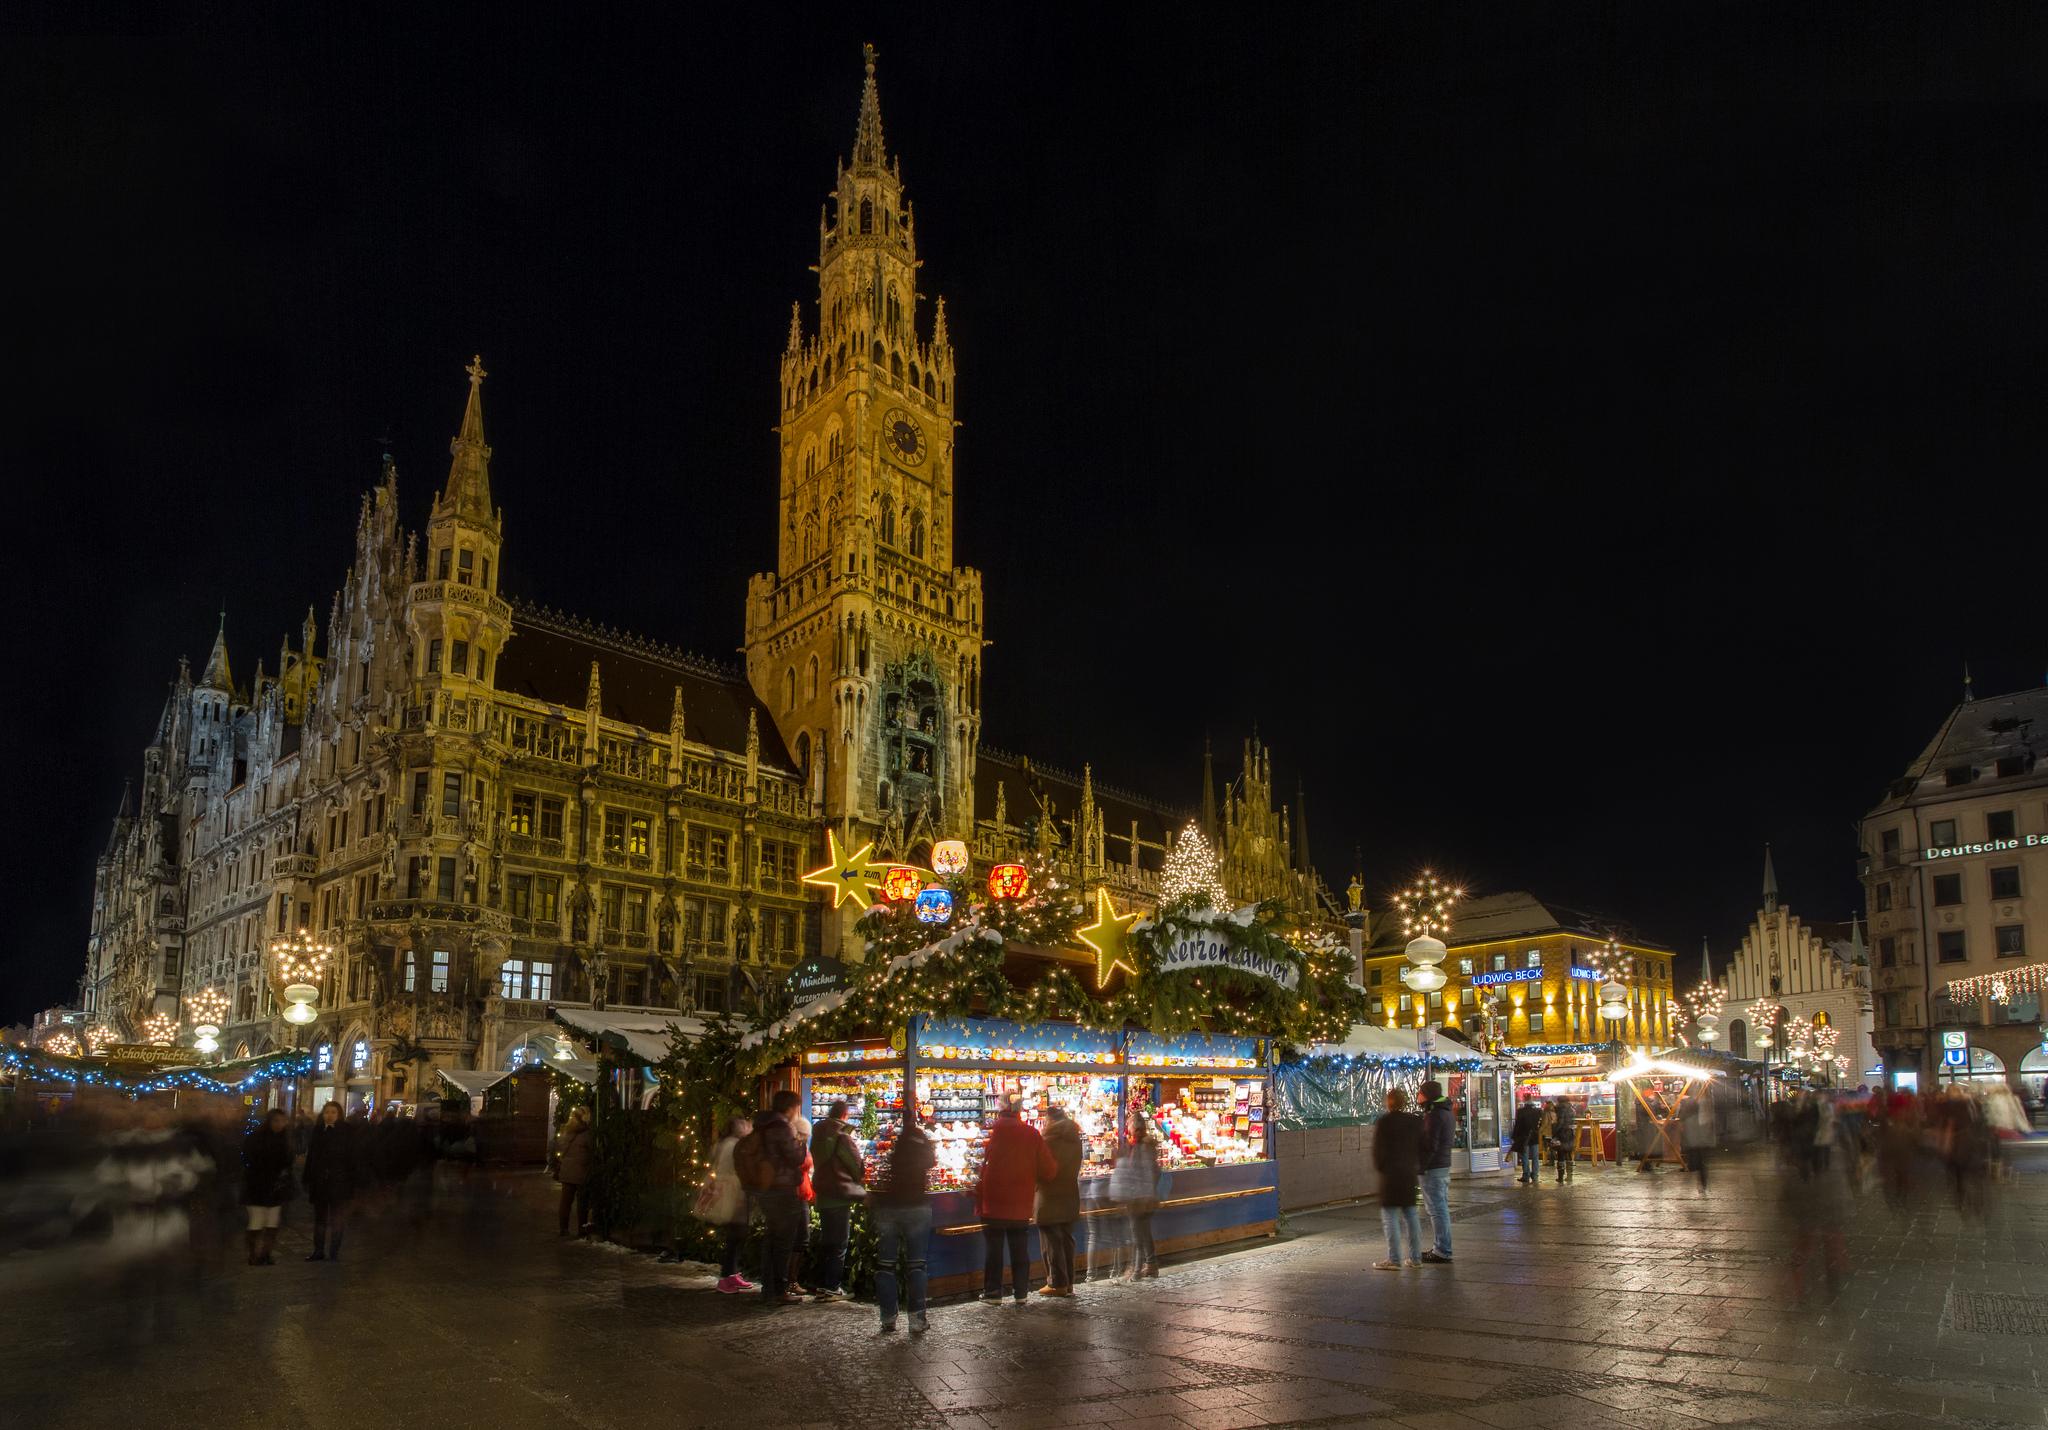 Christmas market at Marienplatz - picture credit Jason Mrachina, Flickr